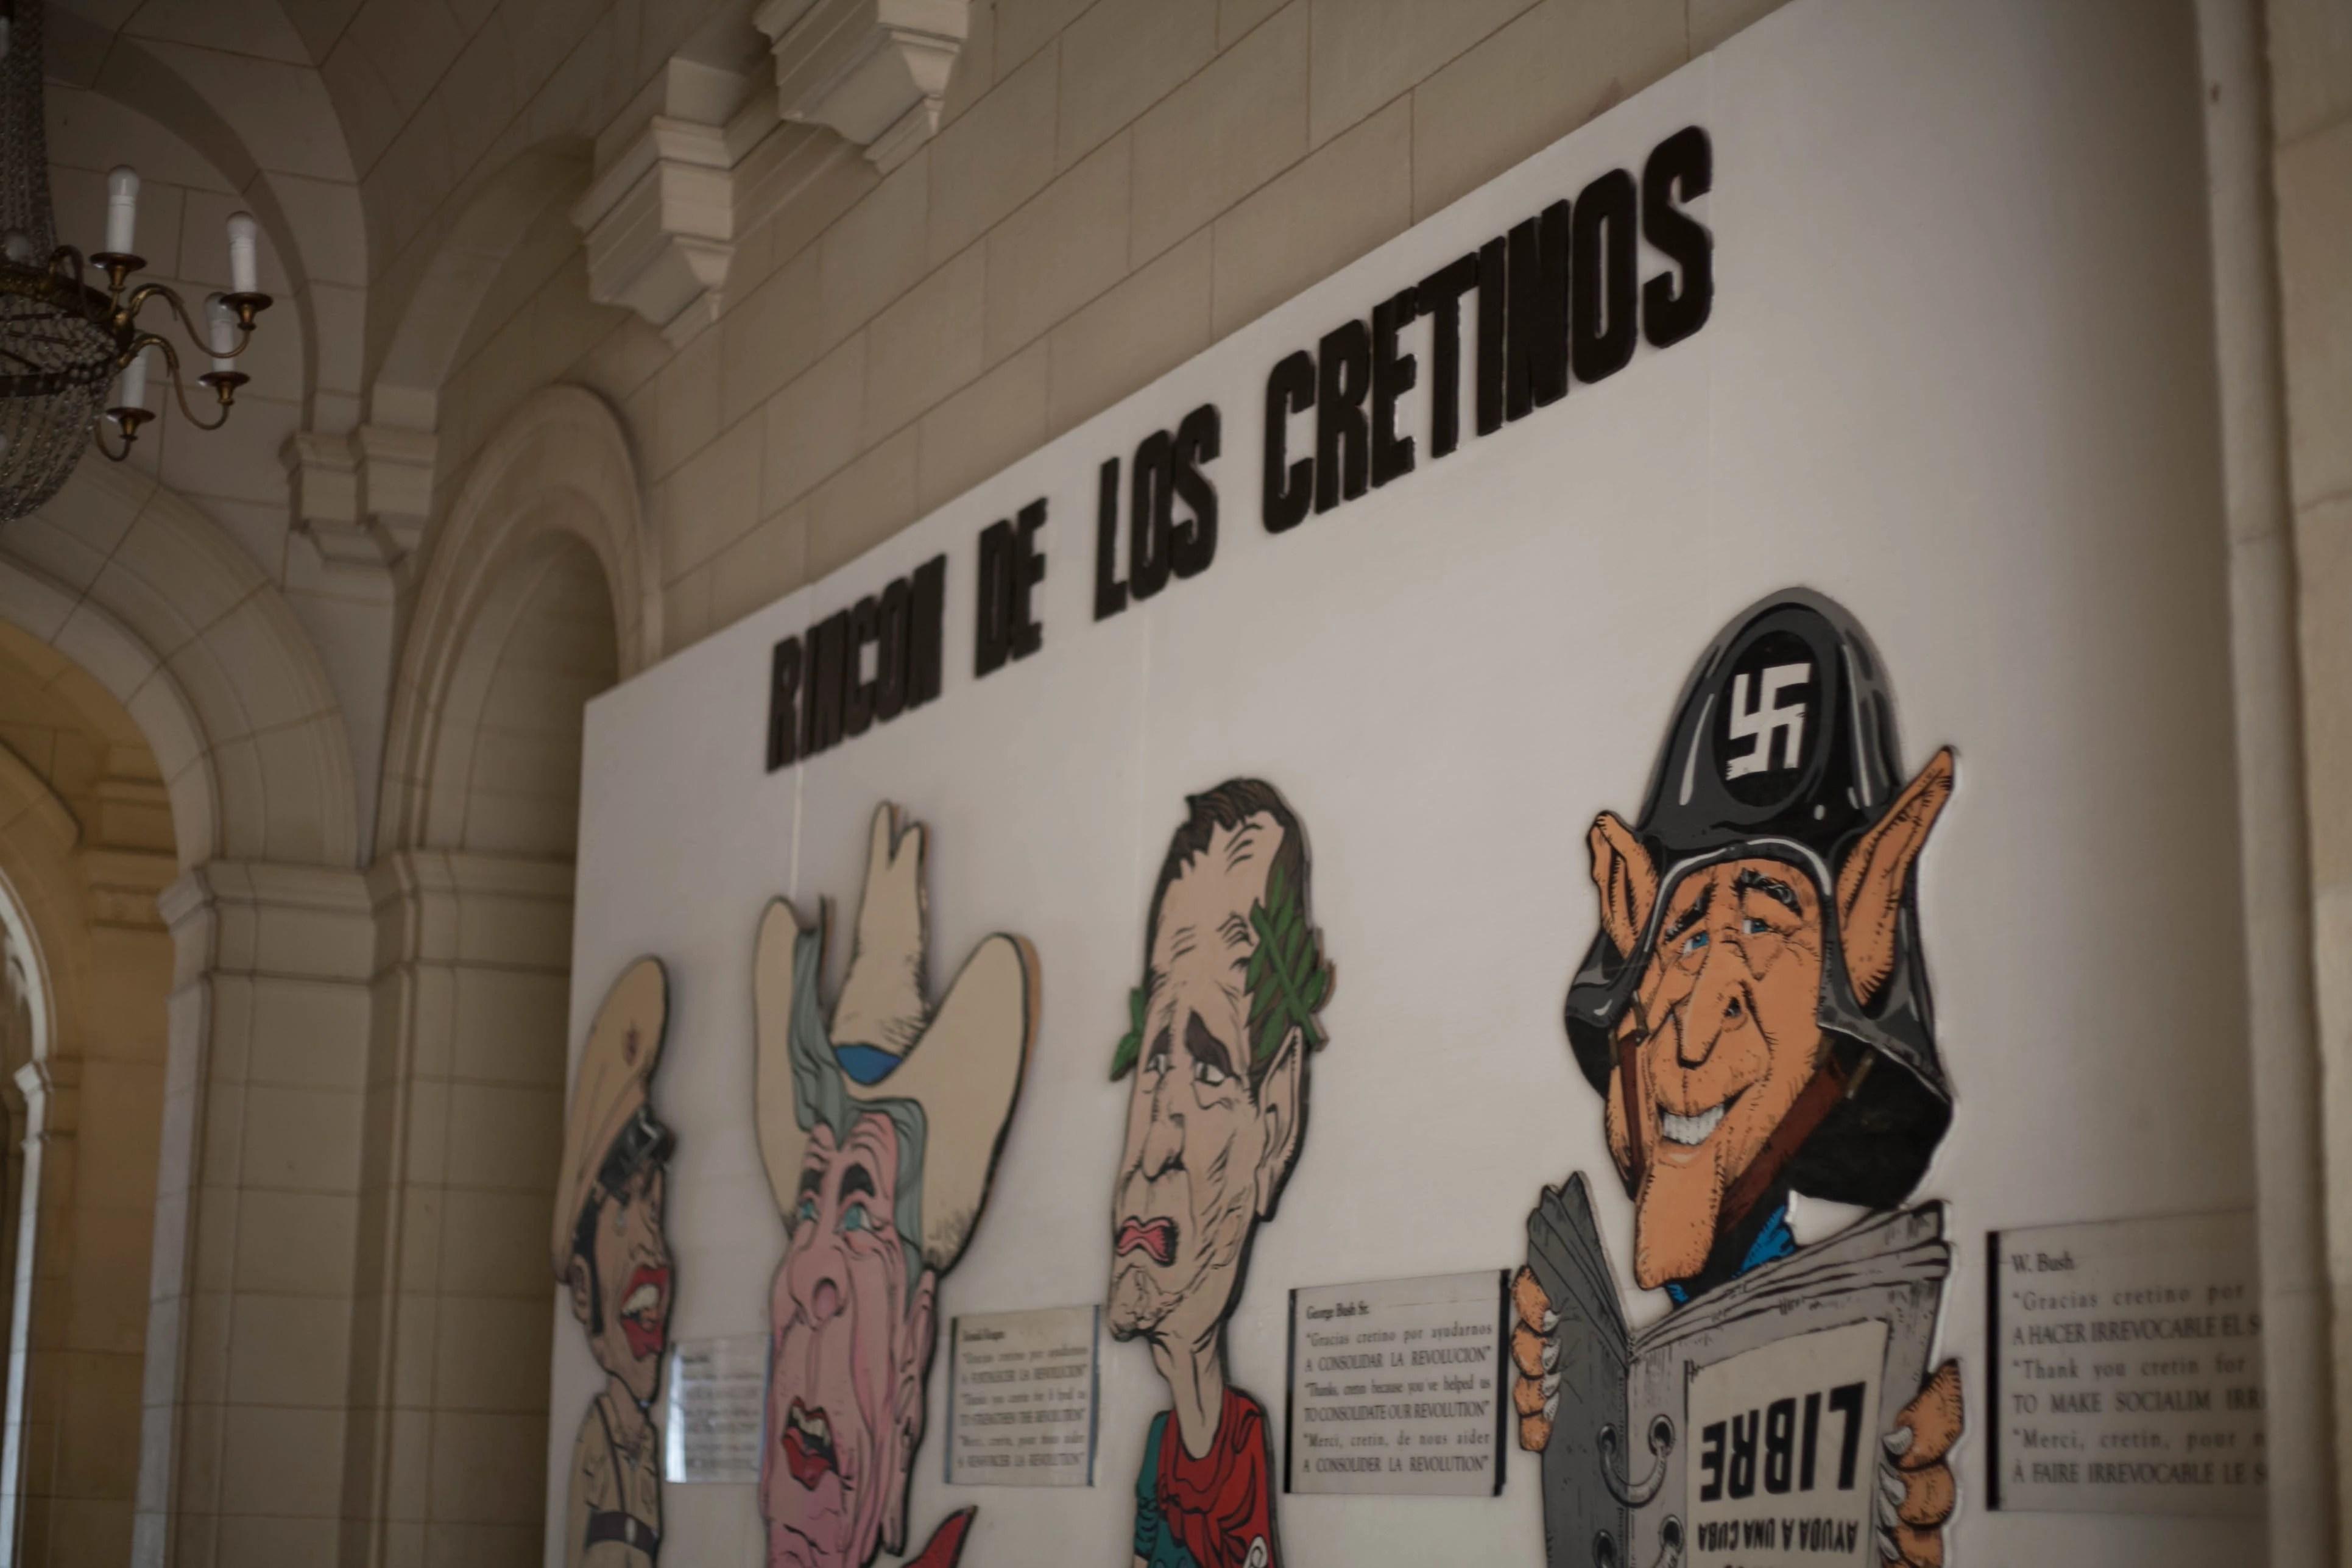 Painel no Museo de la Revolución com os inimigos: o ditador Fulgencio Batista, e os ex- presidentes americanos Ronald Reagan, Bush pai e Bush filho. Foto: Veruscka Girio